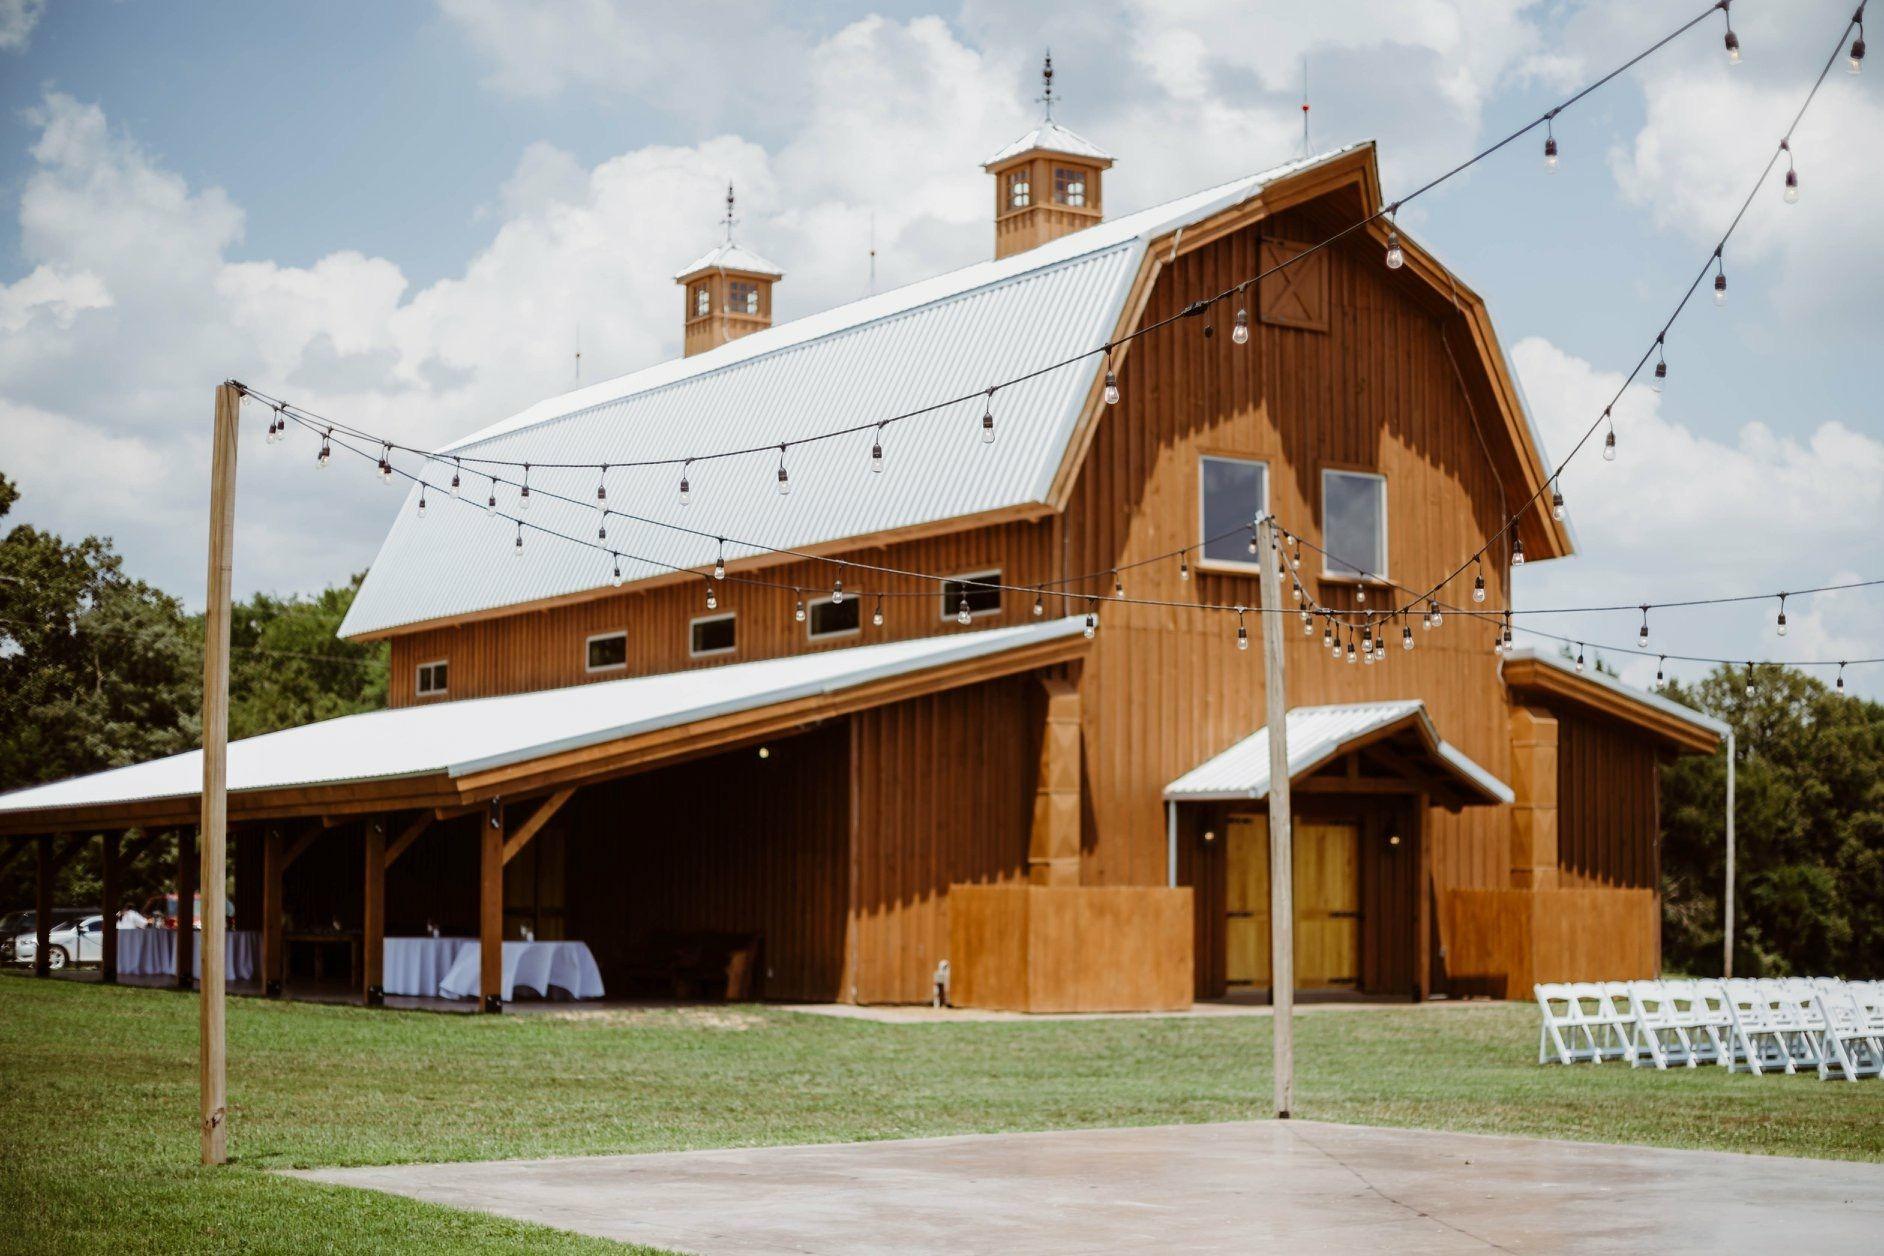 Blessing Barn Wedding Event Venue 80 Raines Cemetery Rd Humboldt Tn 38343 731 694 0865 Barn Venue Wedding Event Venues Venues